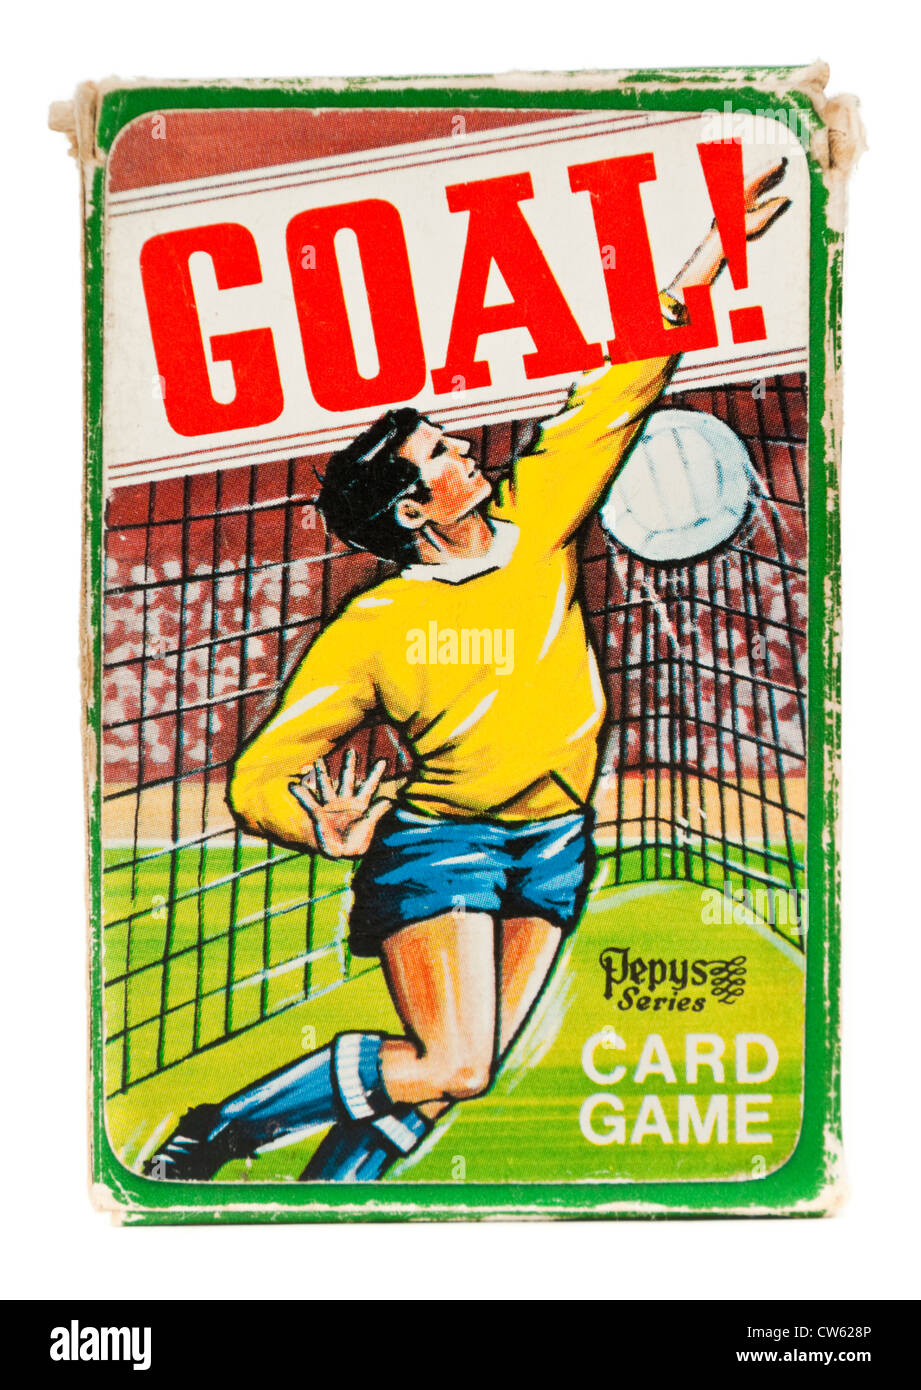 Goal Games